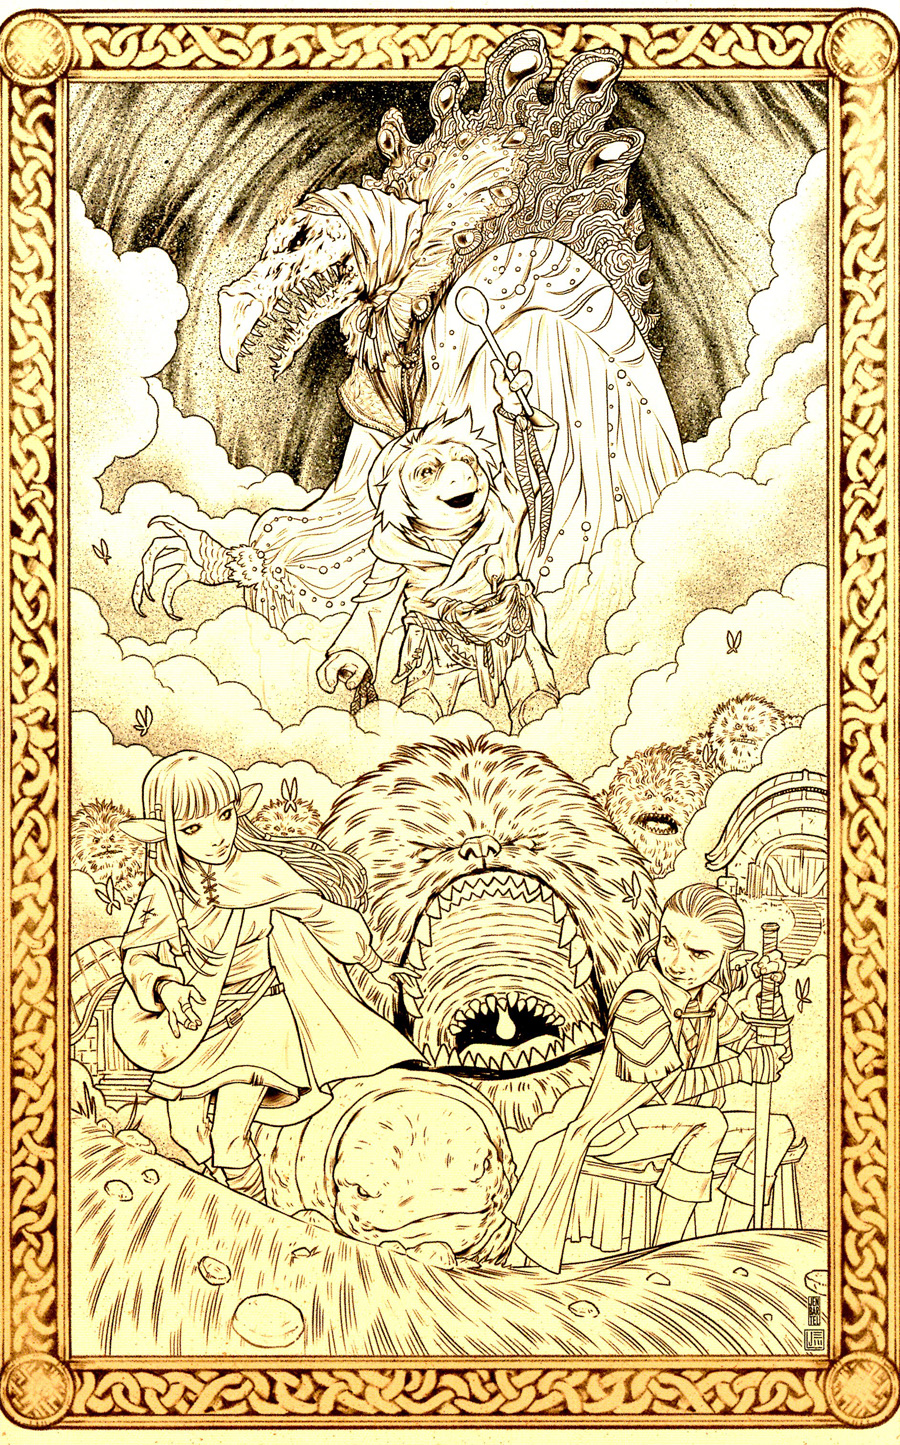 Jim Hensons Dark Crystal Age Of Resistance #8 Cover D Incentive Jake Wyatt & Jen Bartel Variant Cover